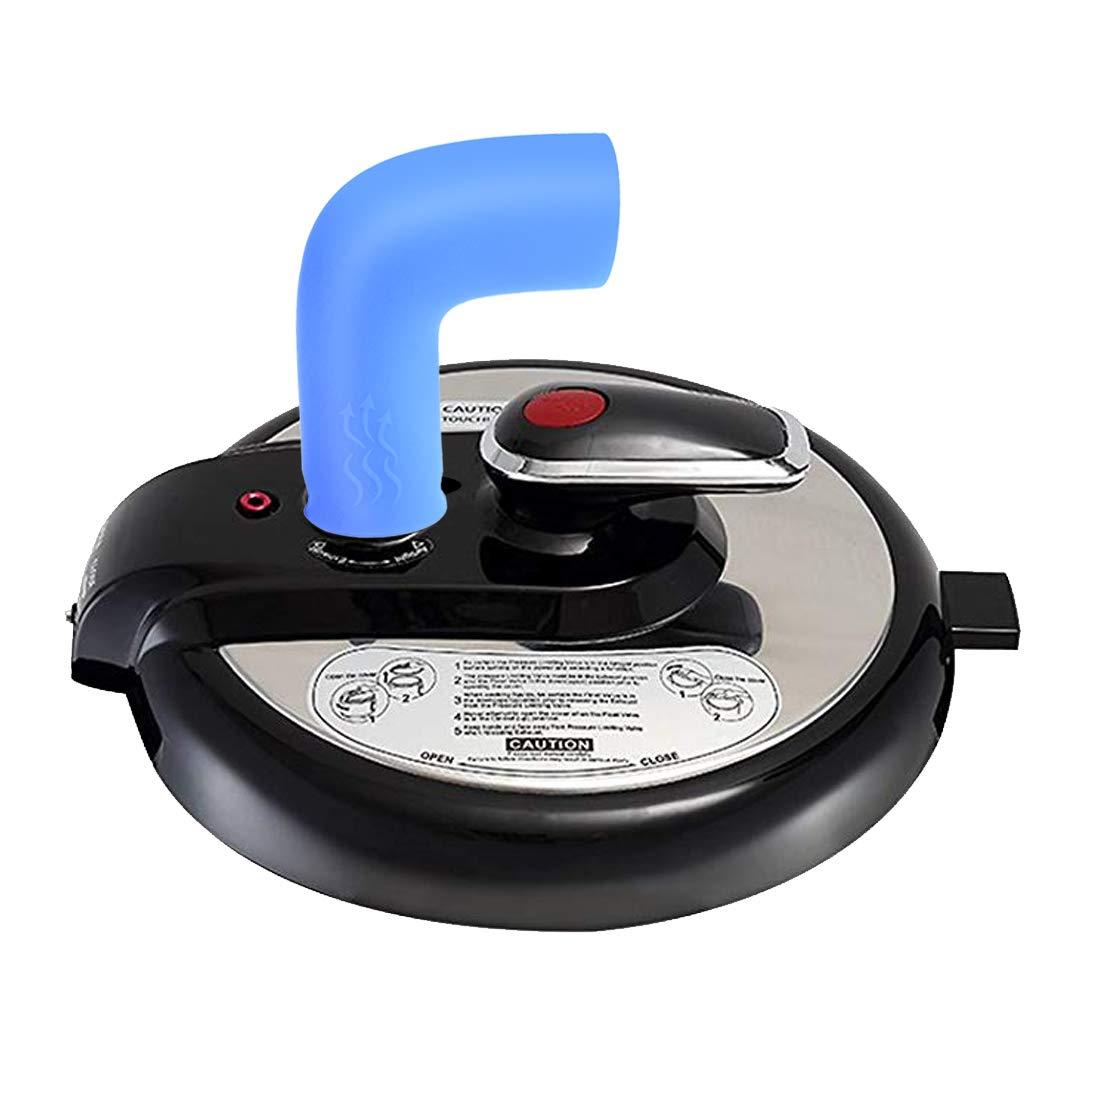 TENACHI Steam Release Pressure Cooker Silinone Diverter 360 Rotation Steam Guide Instant Pot Accesories Duo and Smart Model